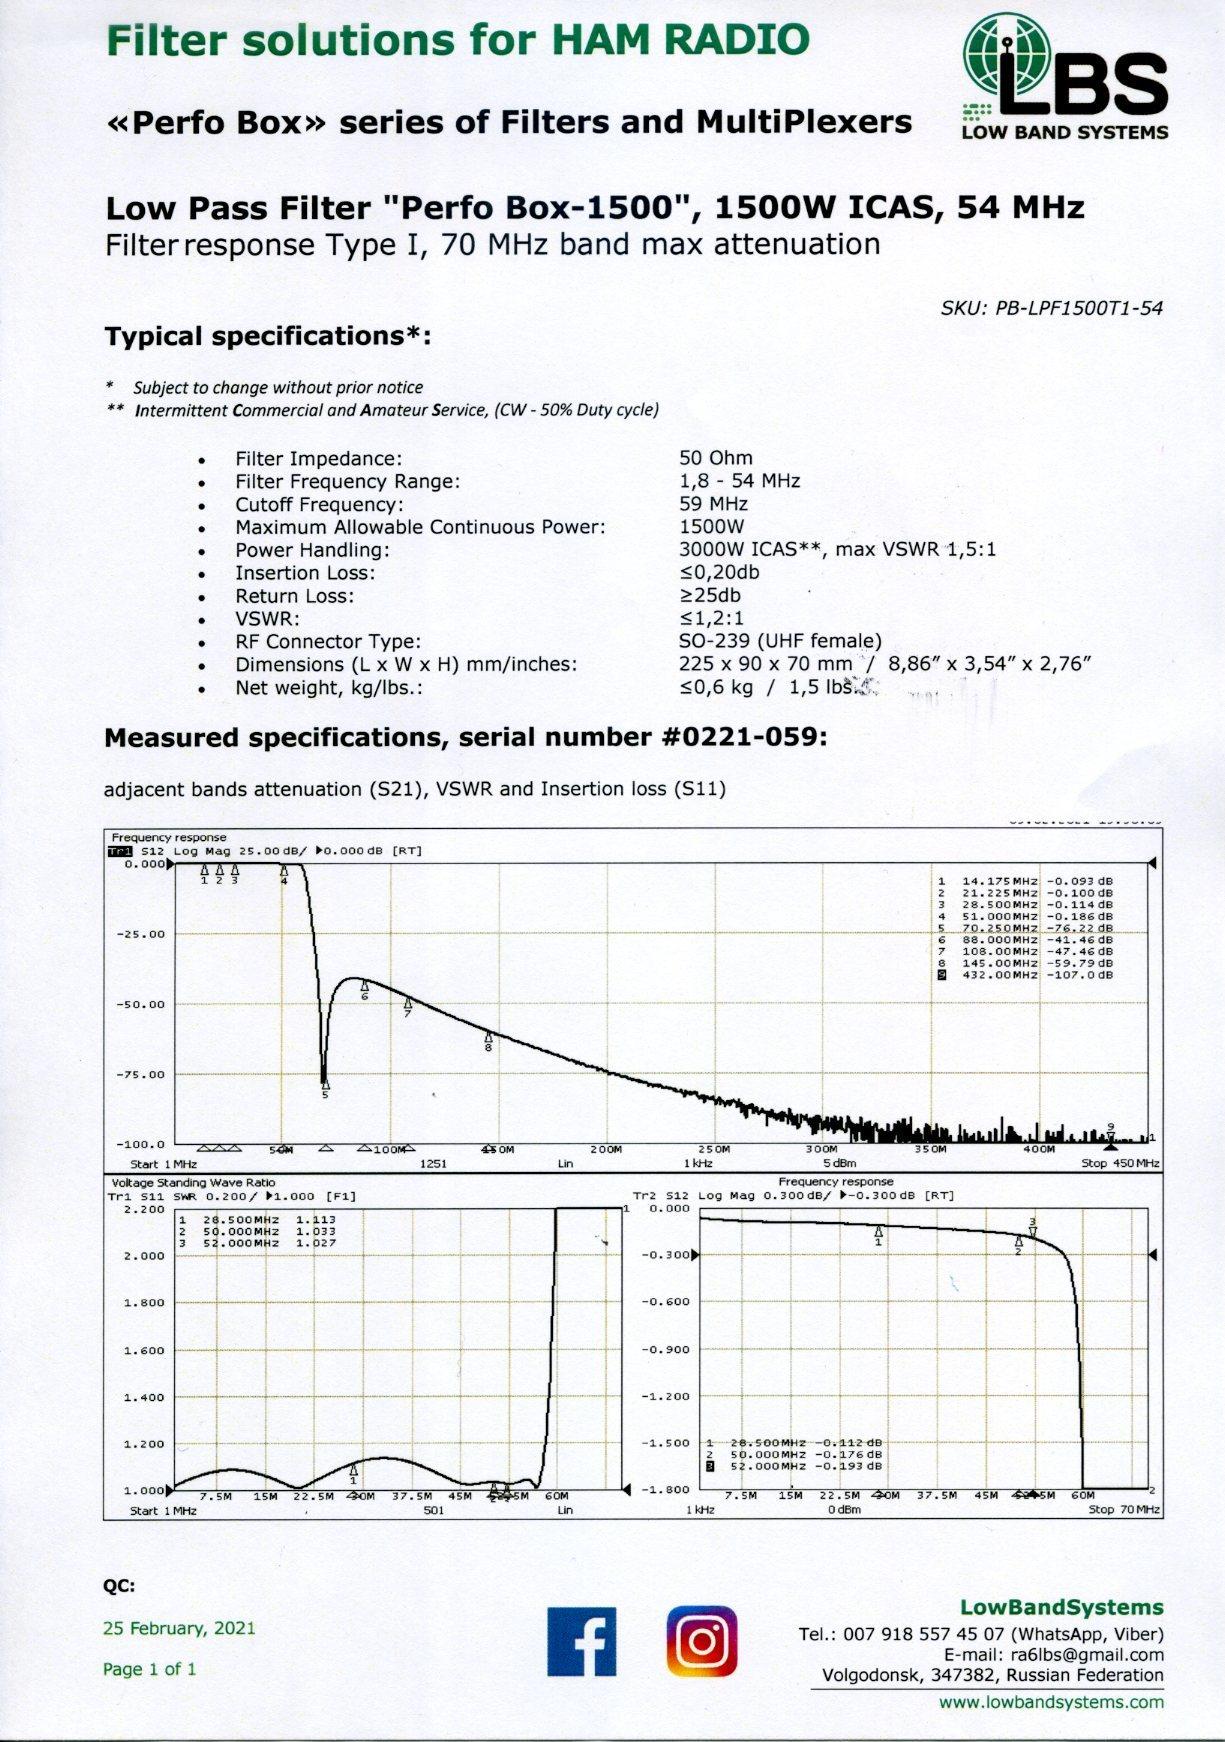 PB-LPF1500-54 Type I